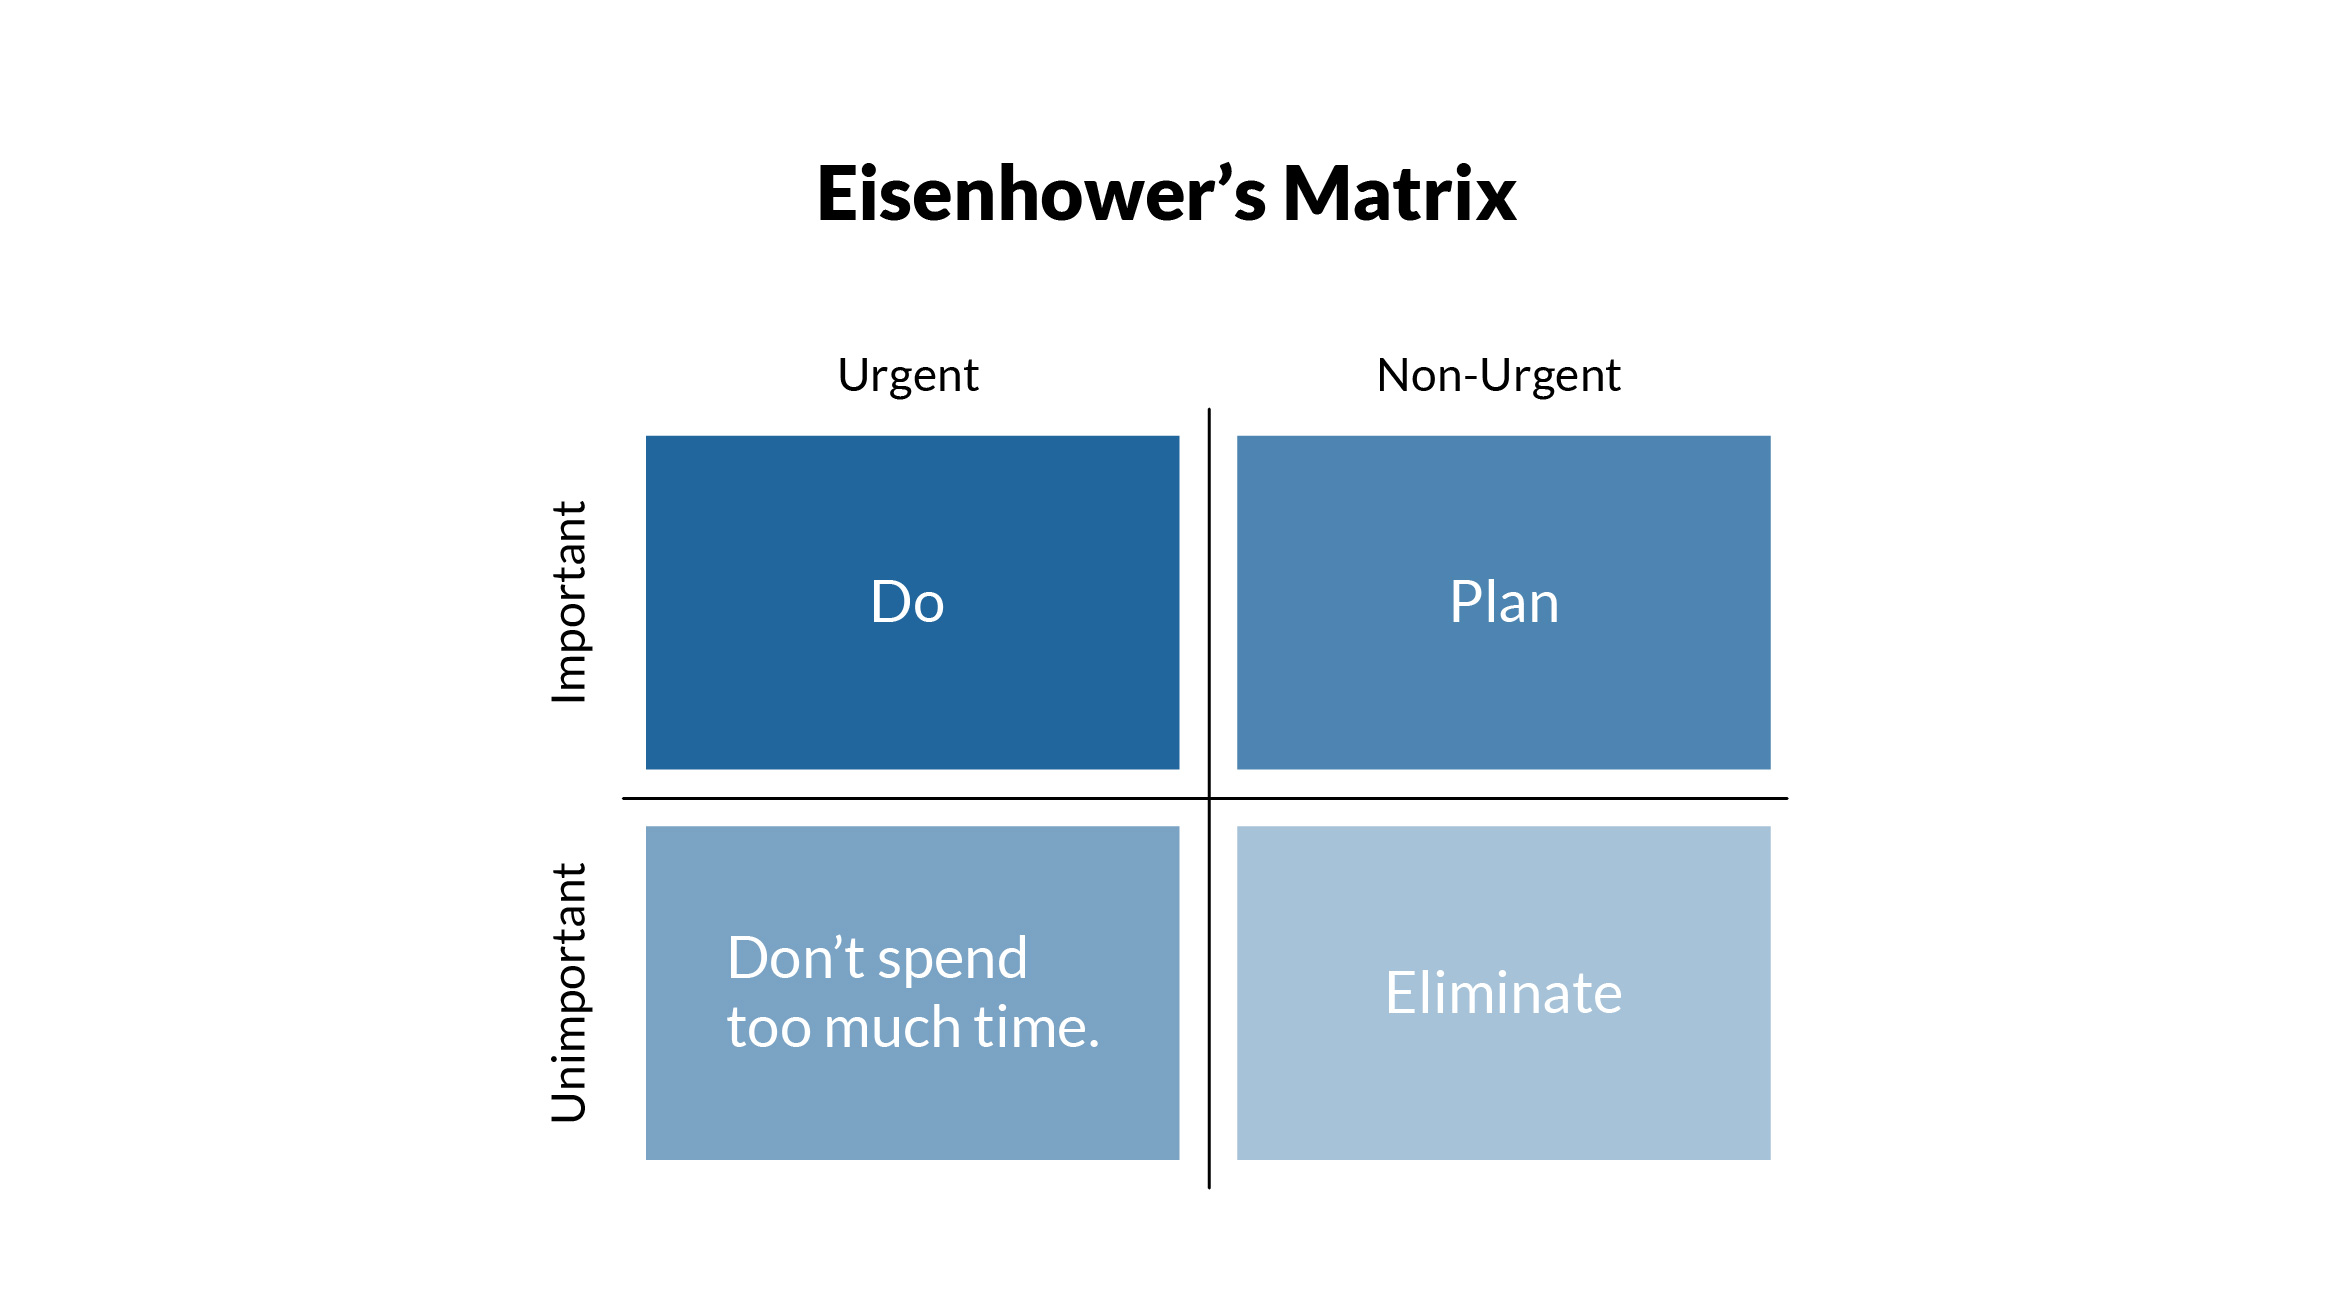 Four Quadrants of Eisenhower's Matrix explained